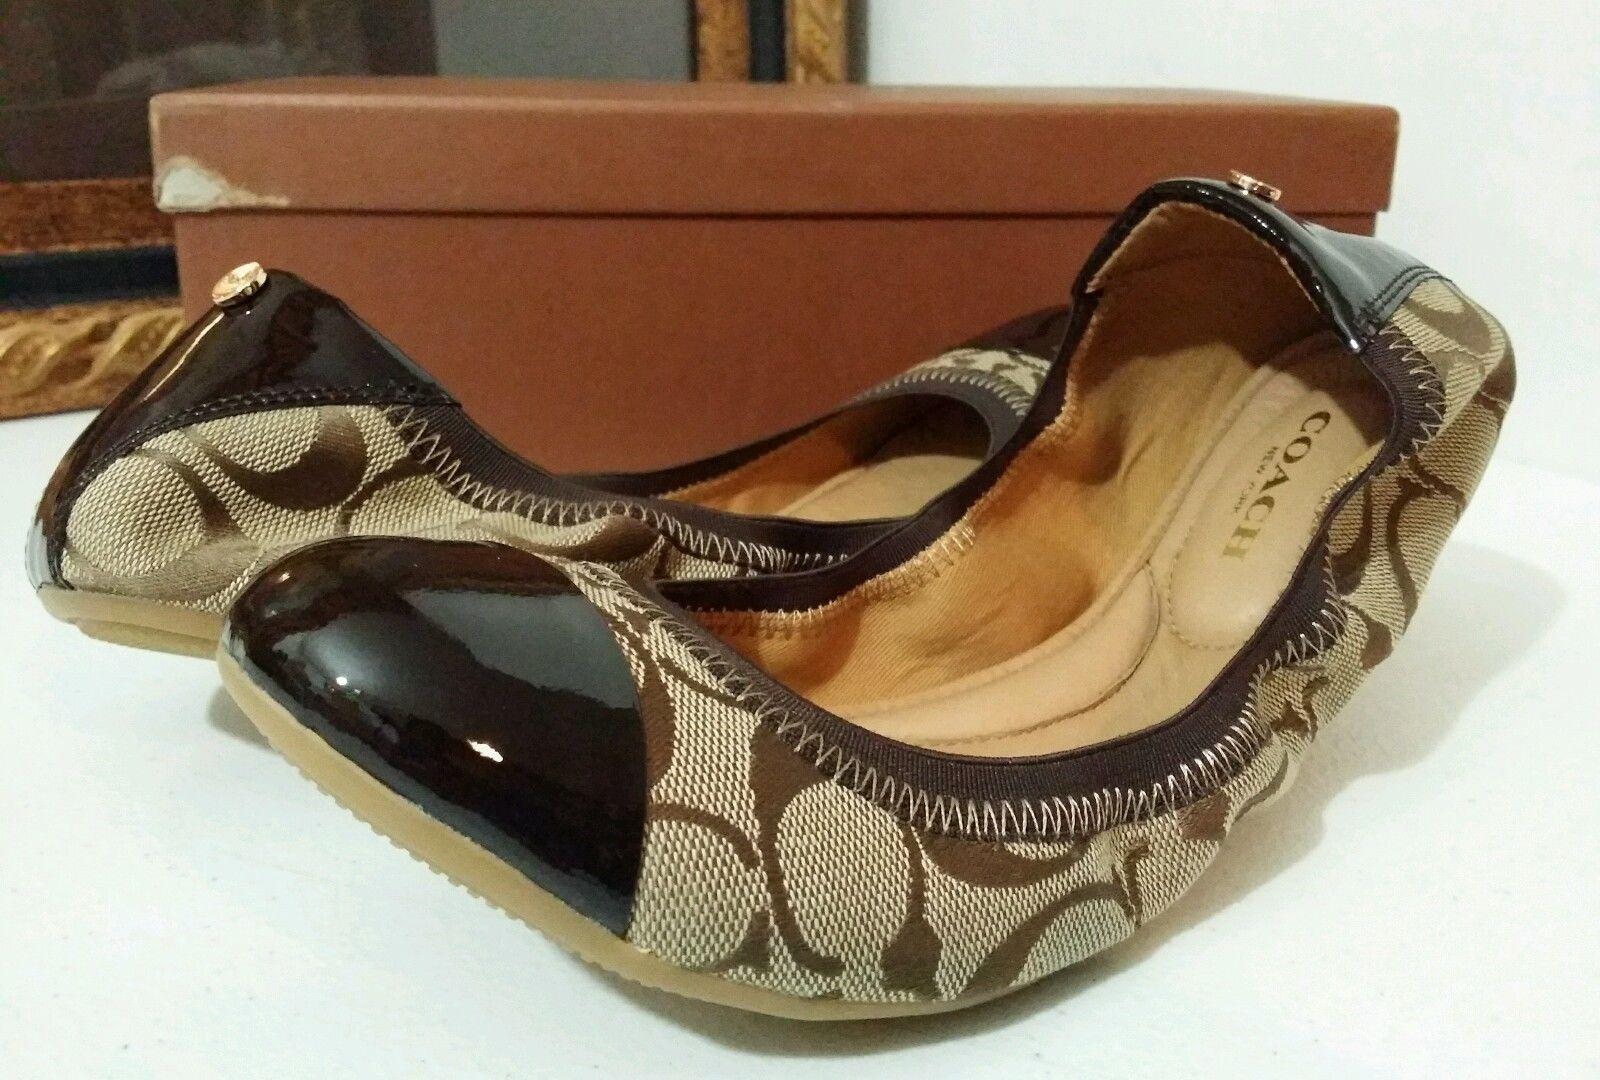 S l1600 S l1600 New COACH Wanda 9 5 M Women Ballet Flat Khaki Chestnut 12cm Sig C Patent